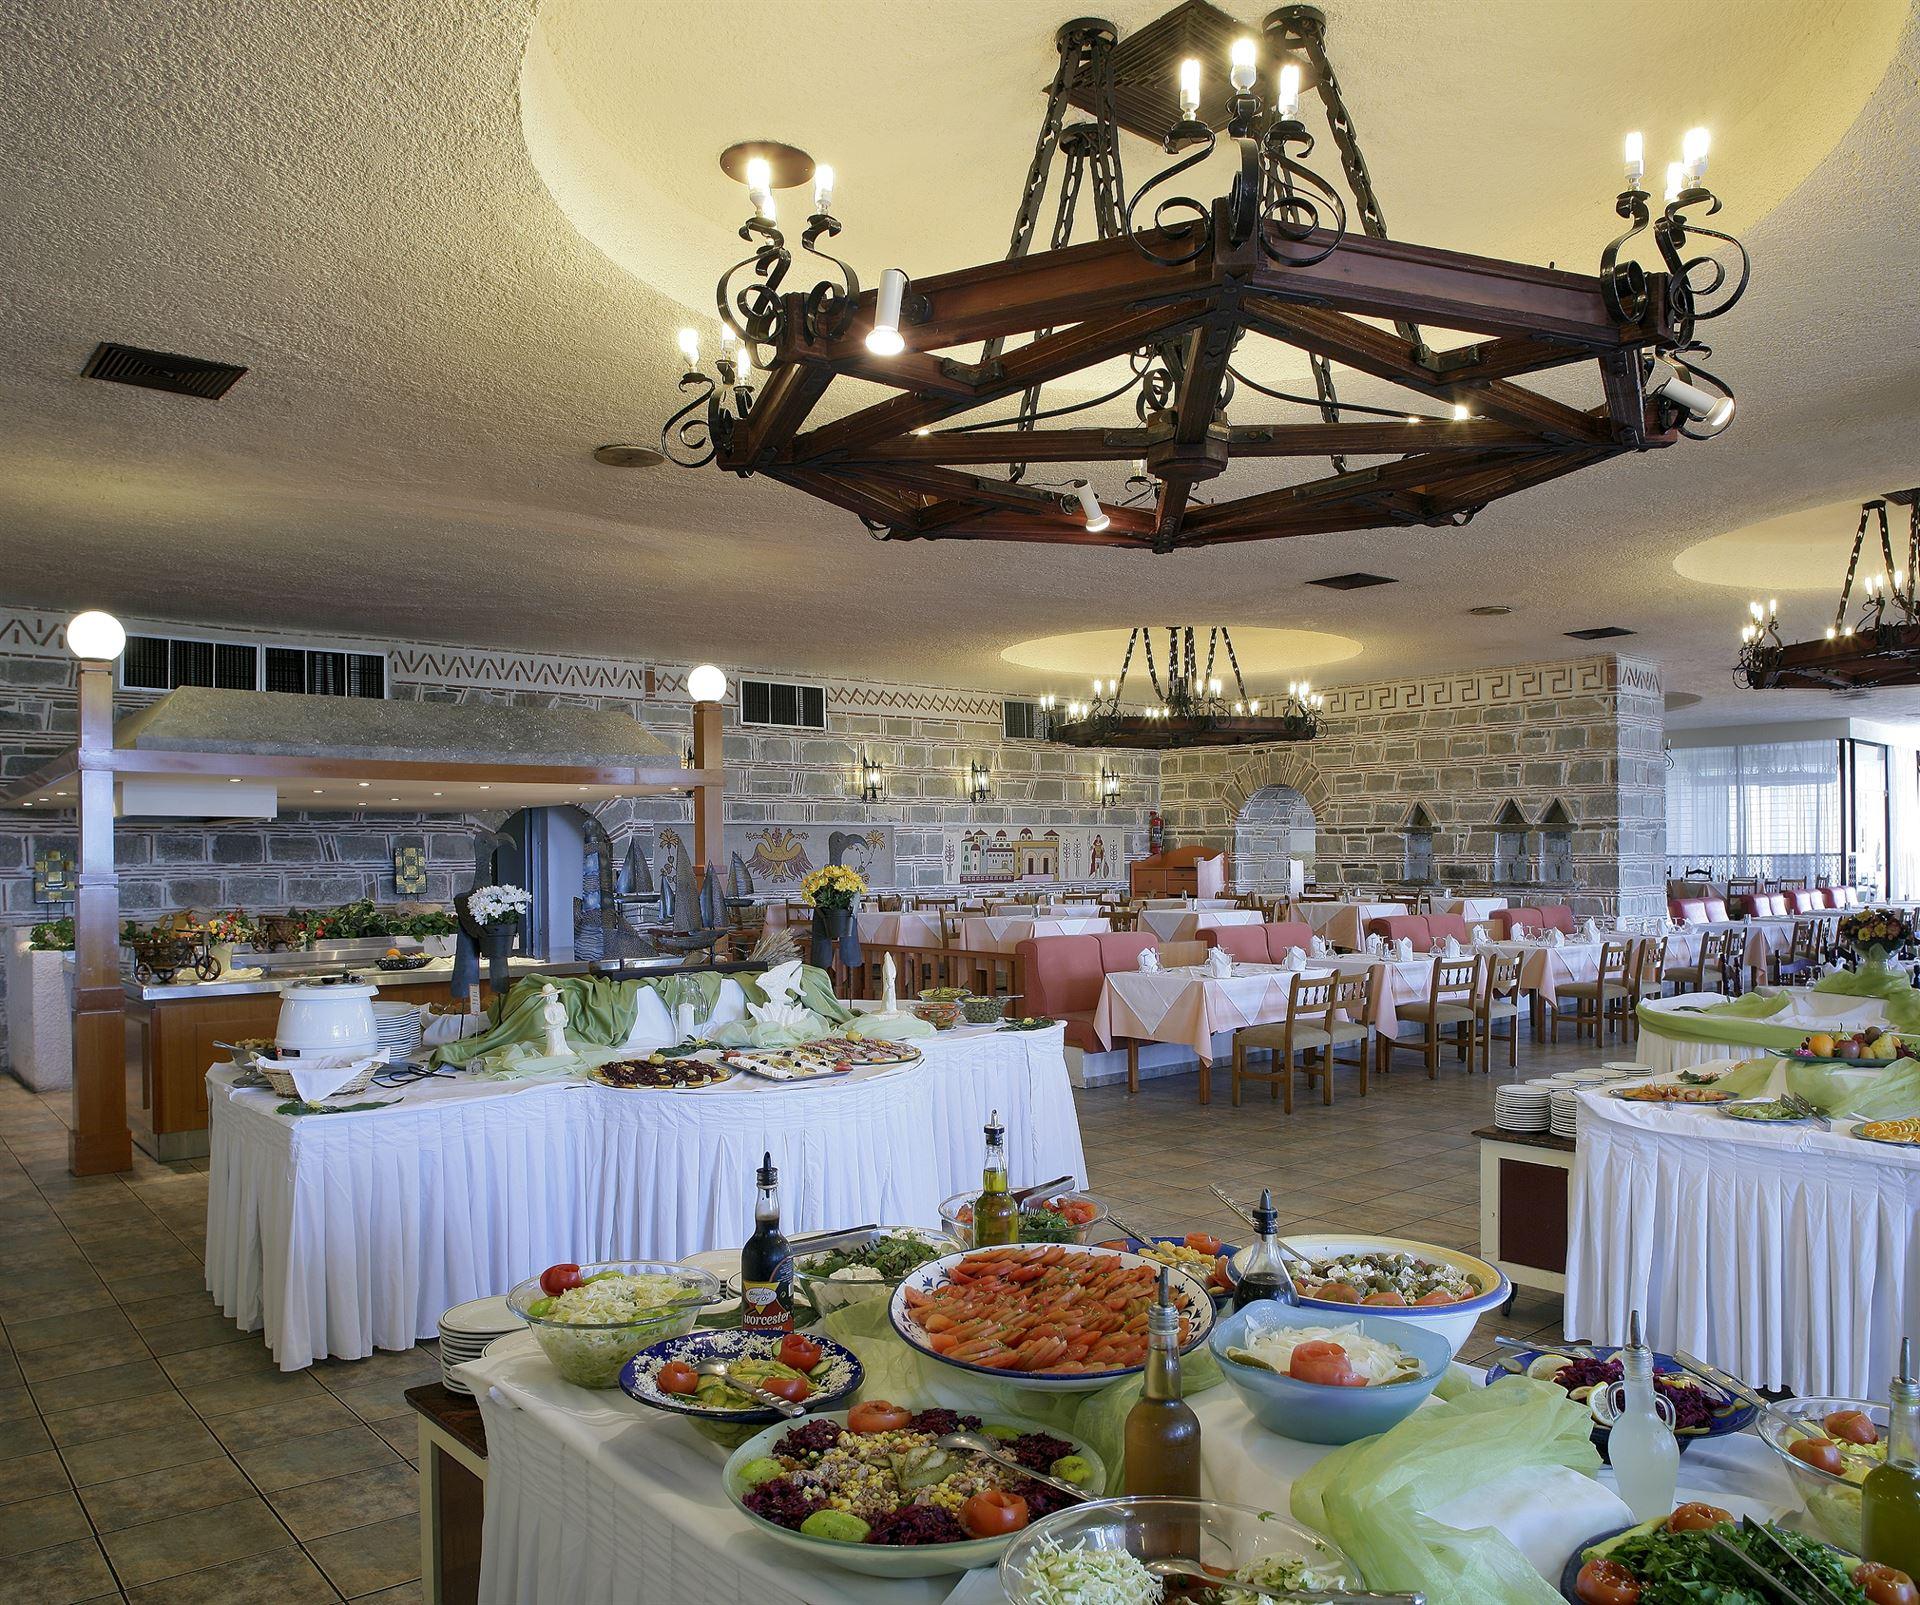 Athos Palace Hotel